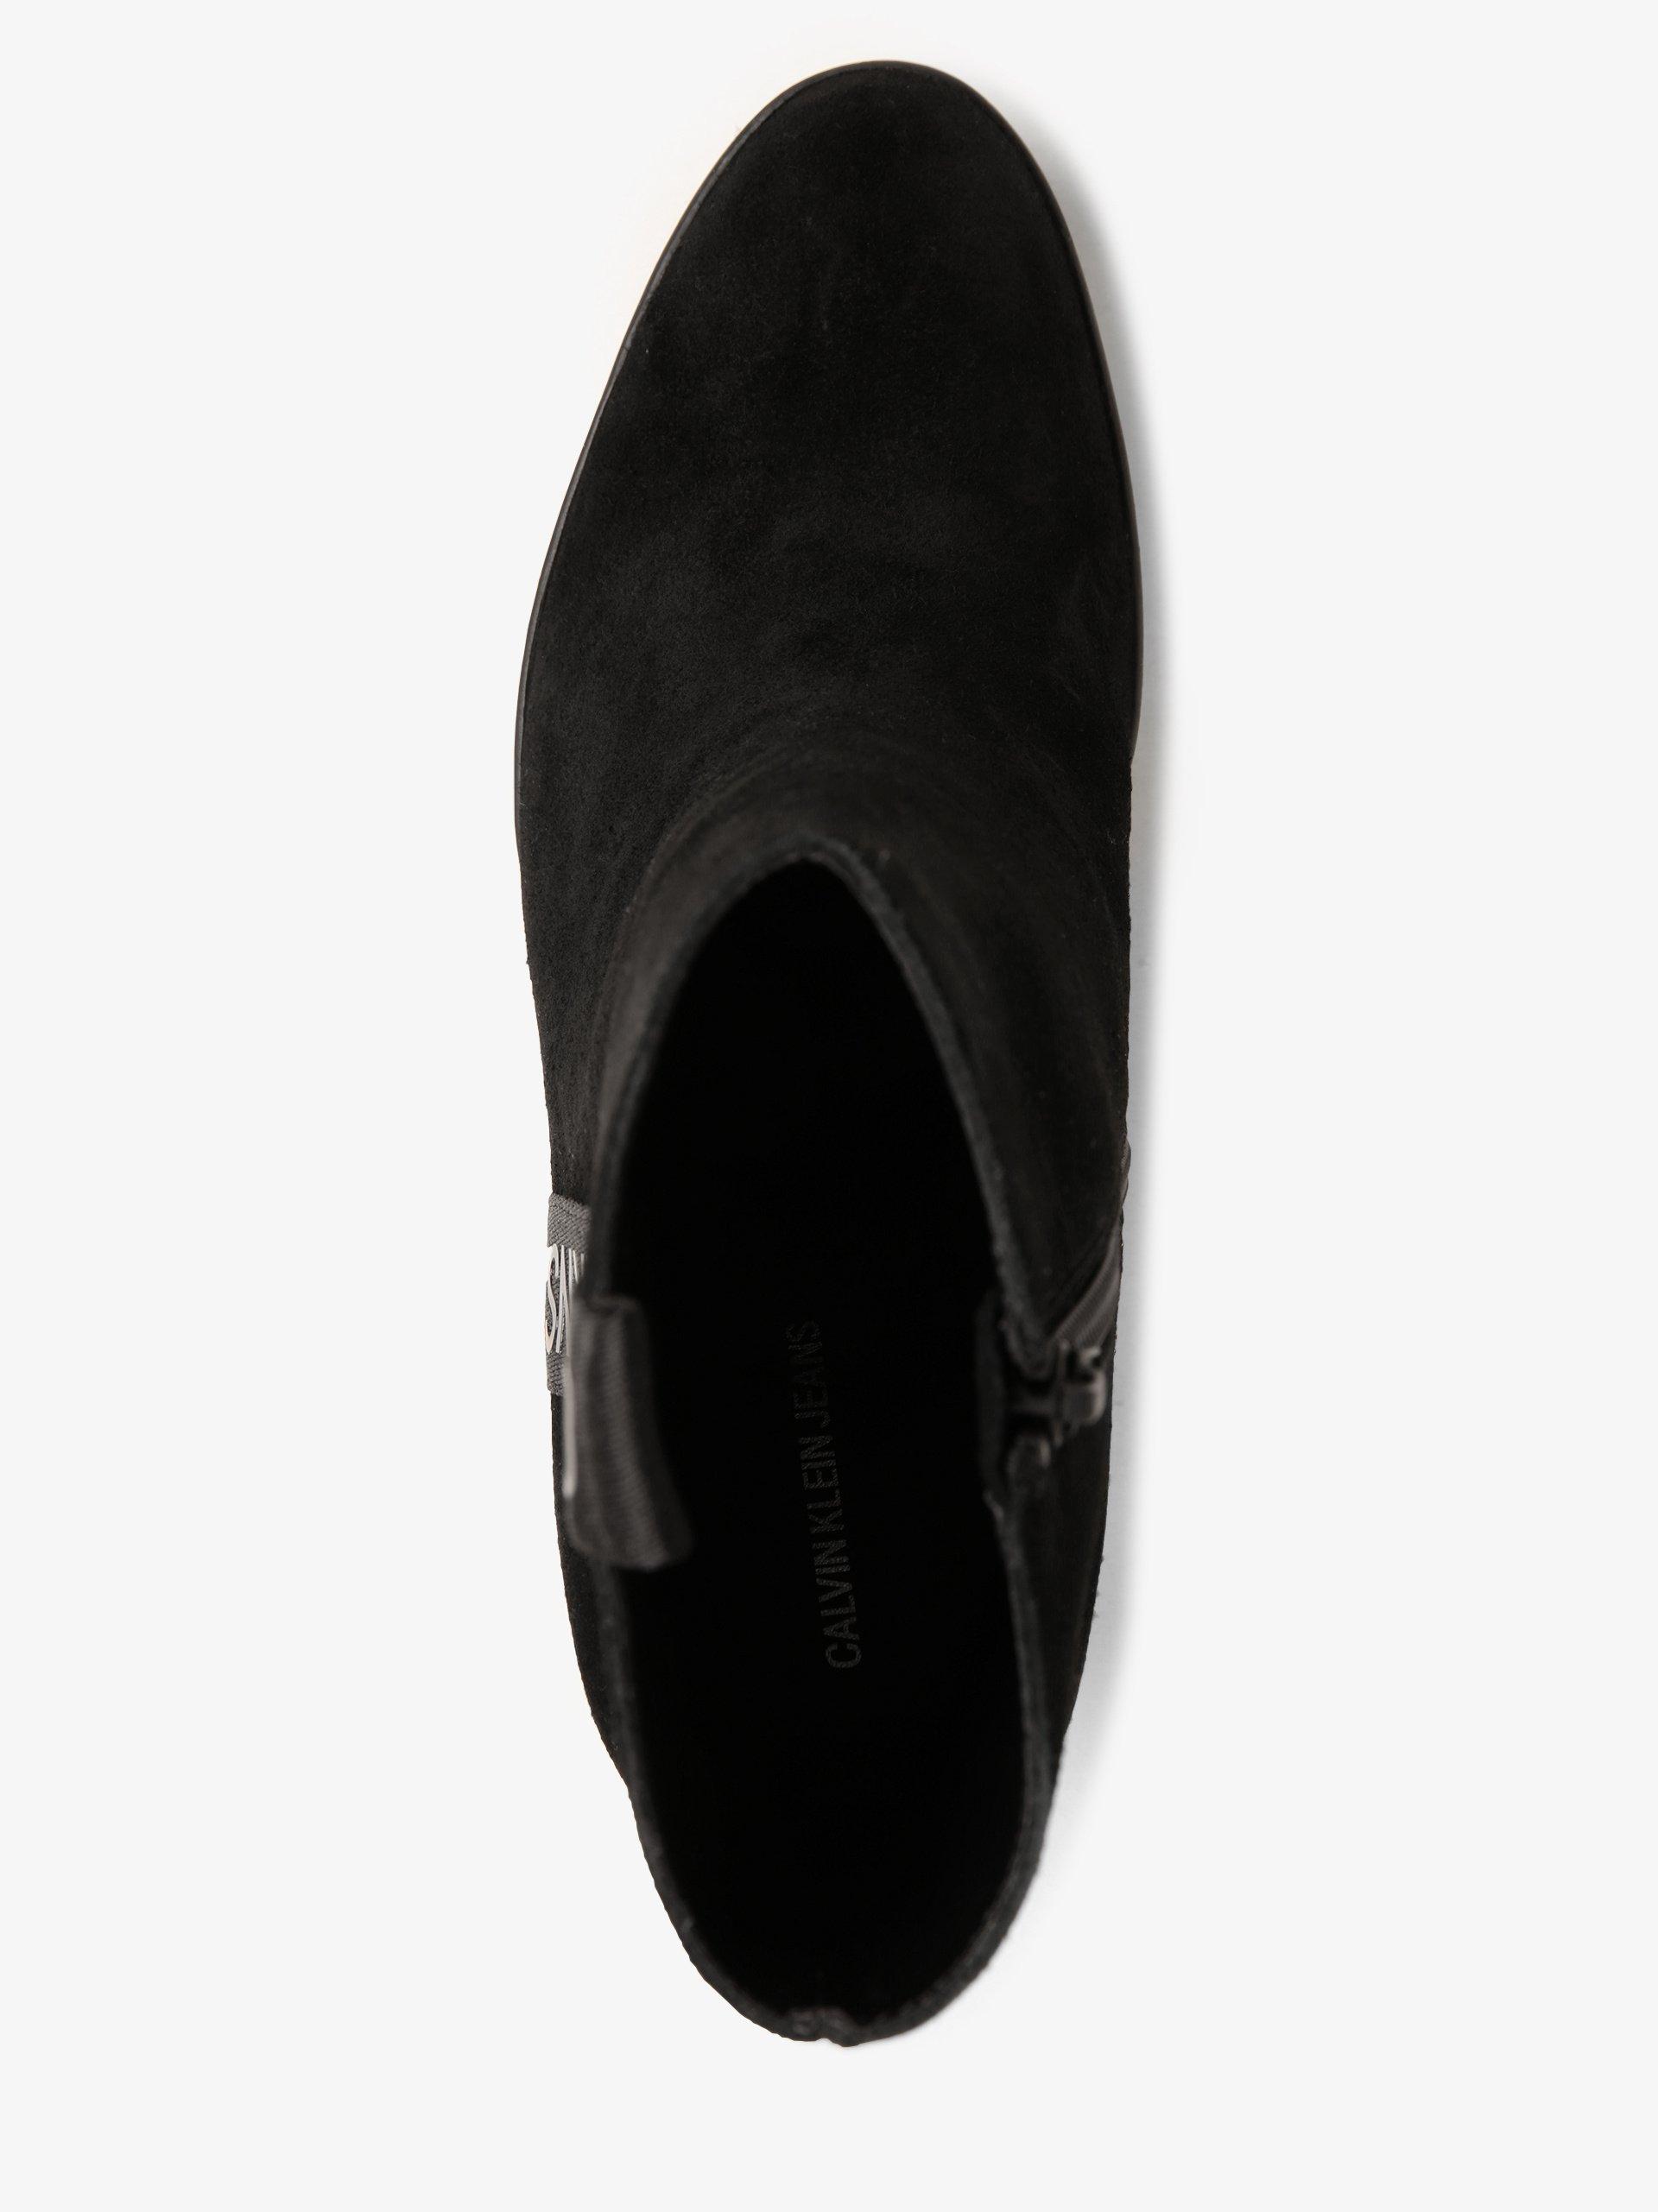 Calvin Klein Jeans Skórzane botki damskie ze skóry – Serina